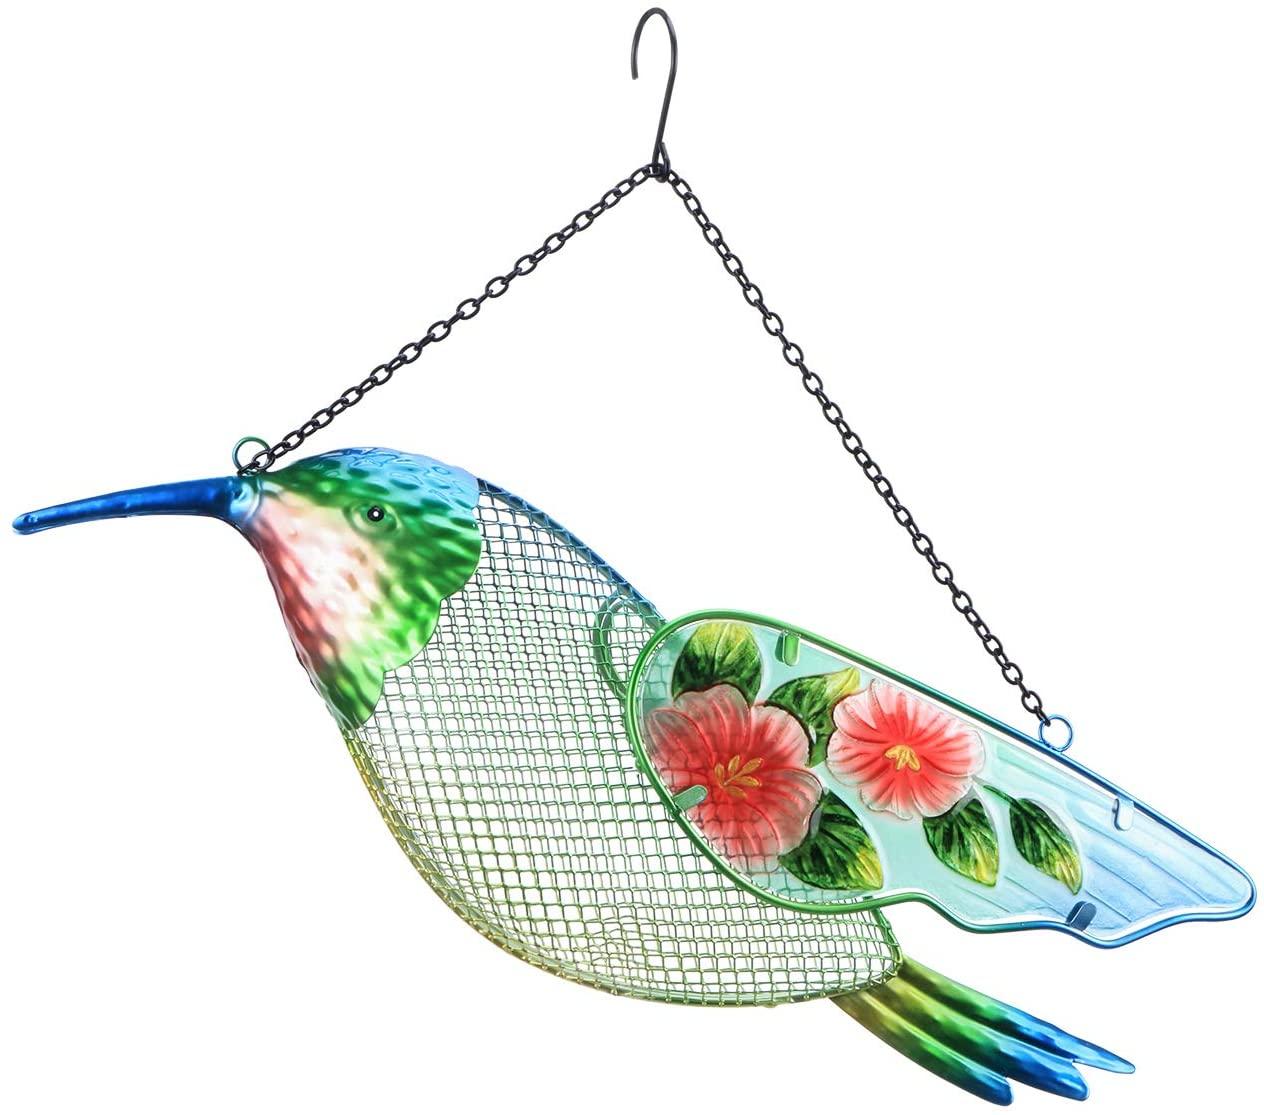 MUMTOP Wild Bird Feeder 17 Inch Hummingbird Metal Outdoor Patio Decor 3.95 Pound